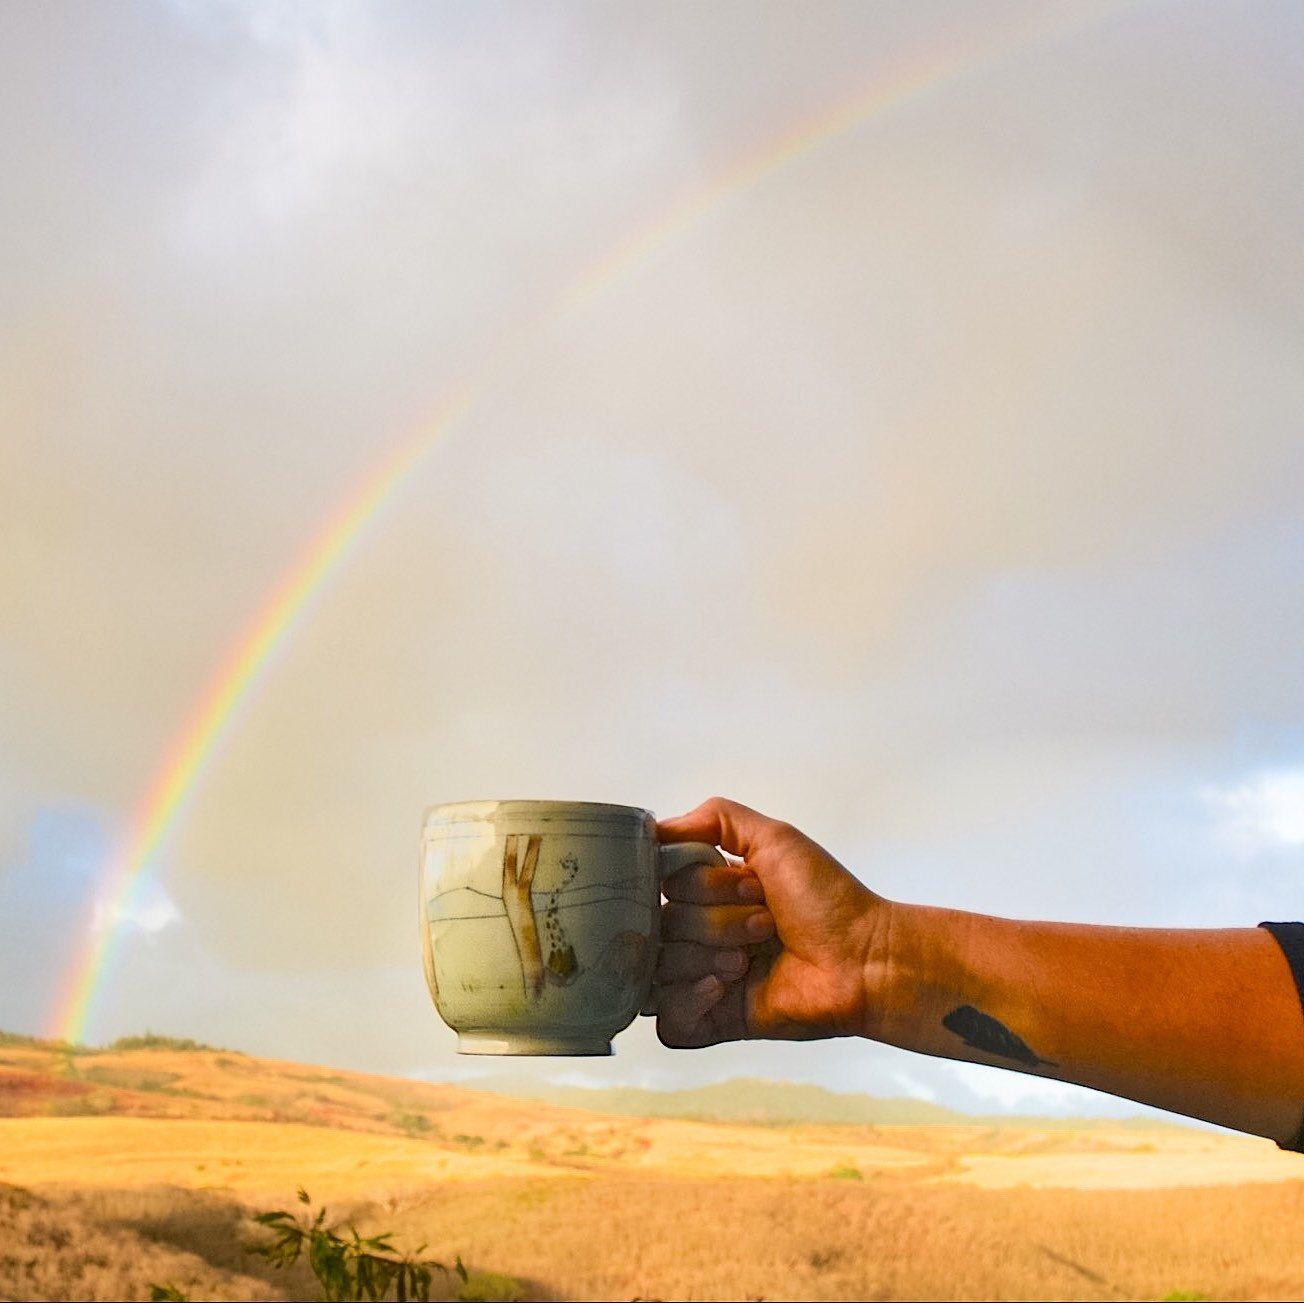 Double rainbow all the way across the sky  Follow this travelin mug on my Instagram @lauriecaffery.clay + under the hashtag #mugonholiday